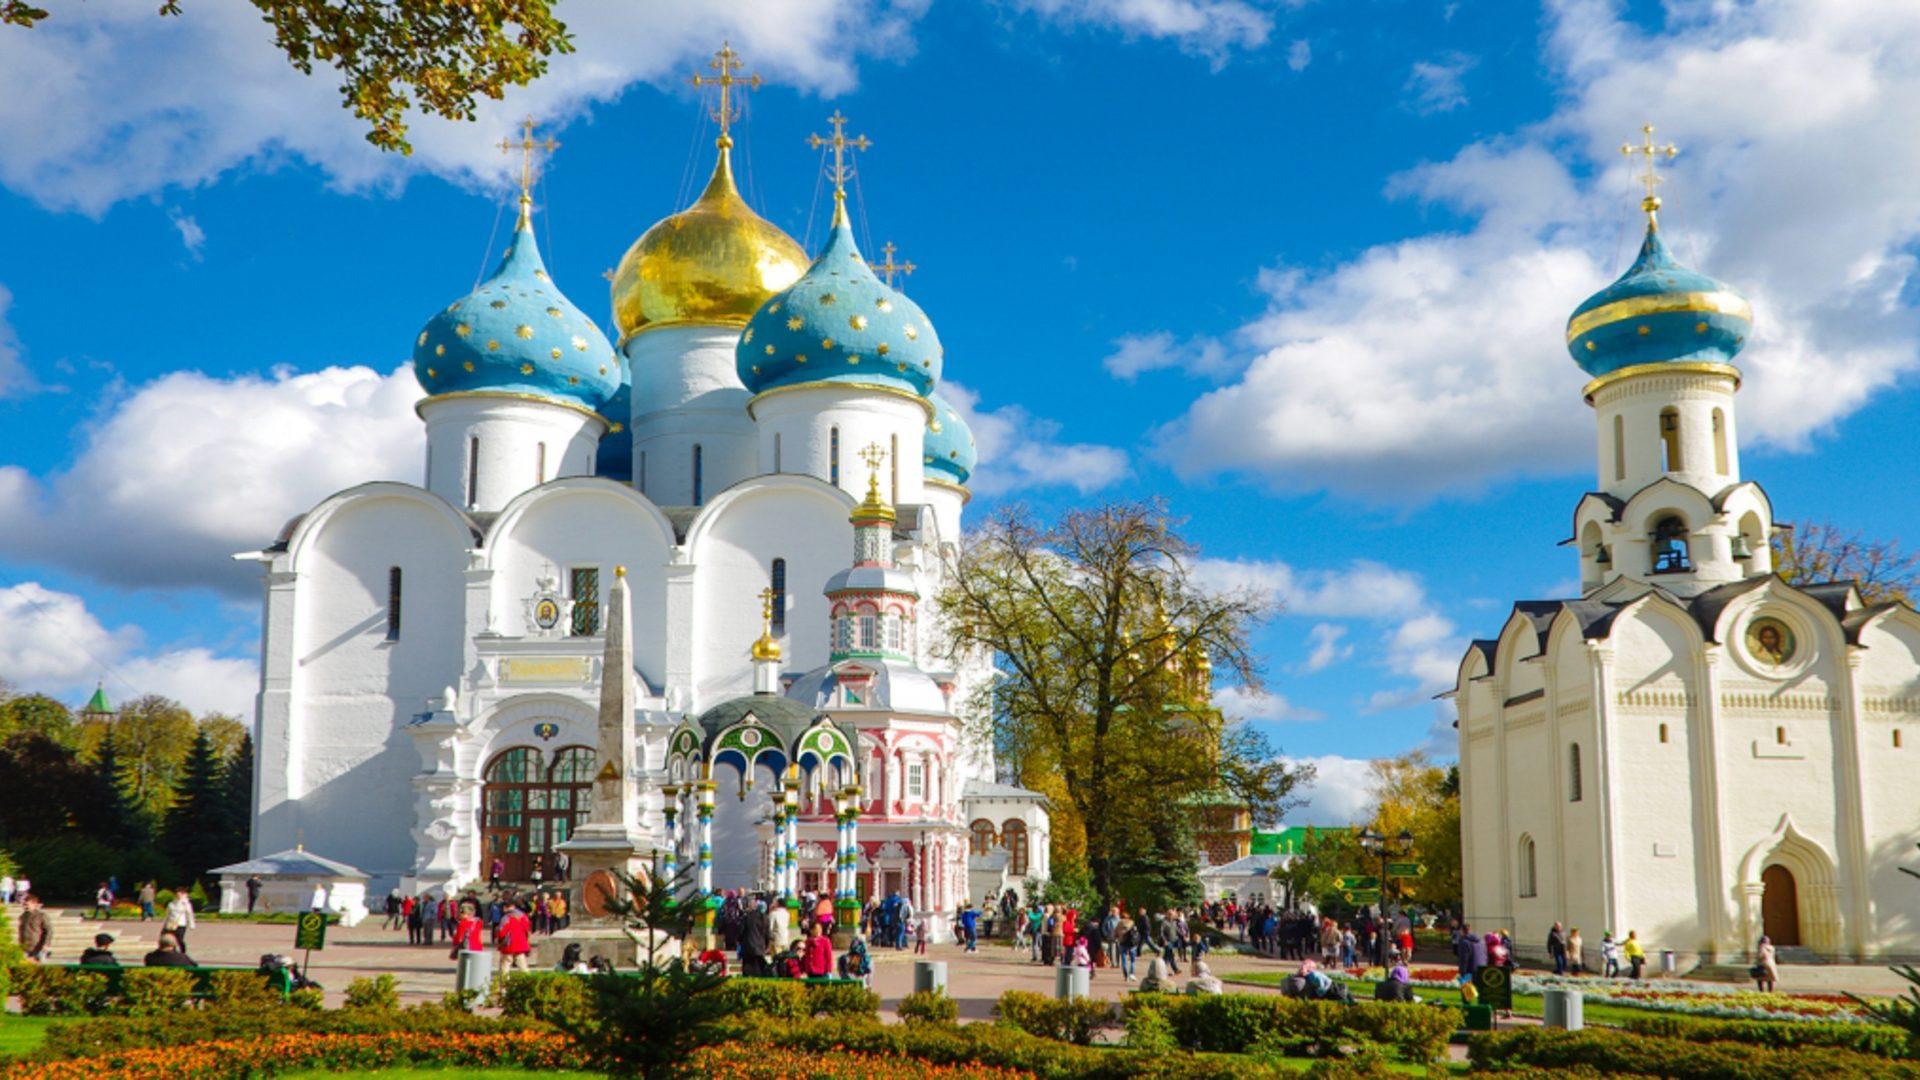 Ziua 6: Scaunul Patriarhal al Rusiei - Lavra Sfintei Treimi